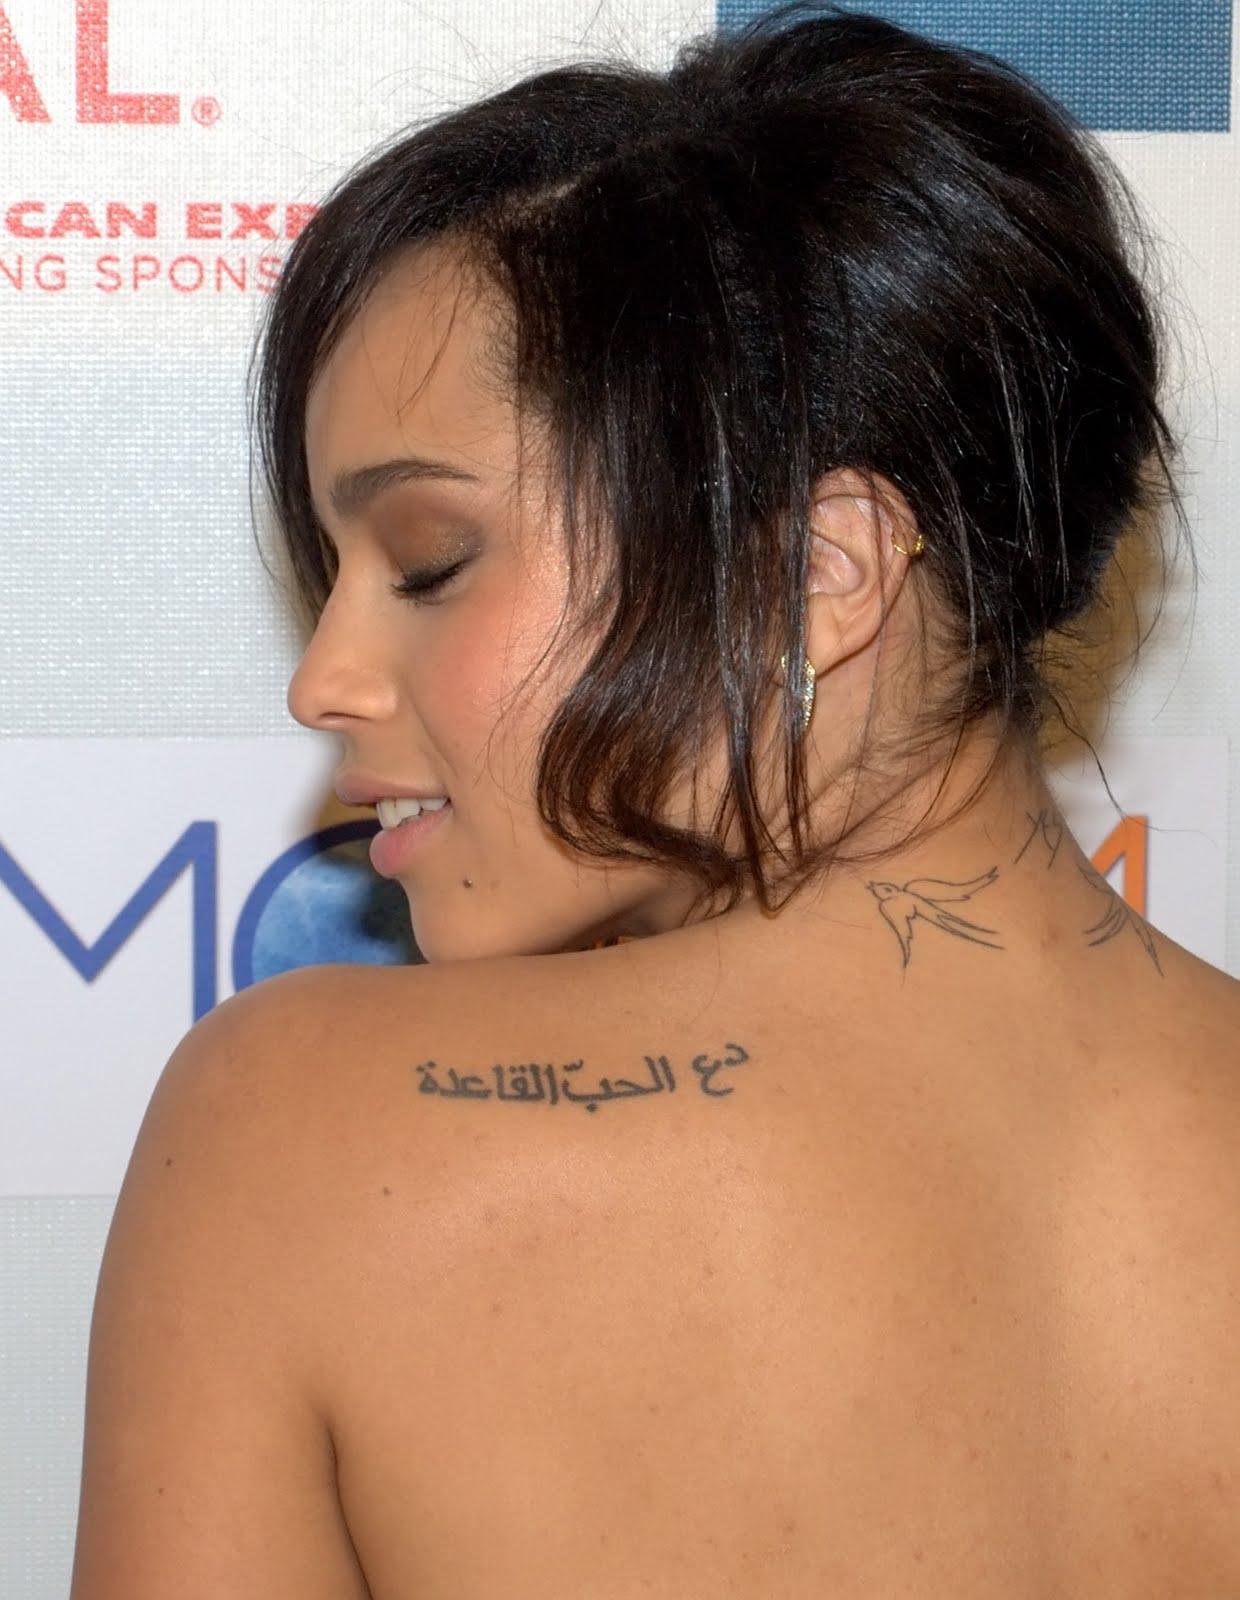 http://2.bp.blogspot.com/-odeAujwijGM/TcvwvnaILtI/AAAAAAAAAzU/1Bae9VcguMc/s1600/Zoe-Kravitz-tattoos-Shankbone-2010-NYC.jpg